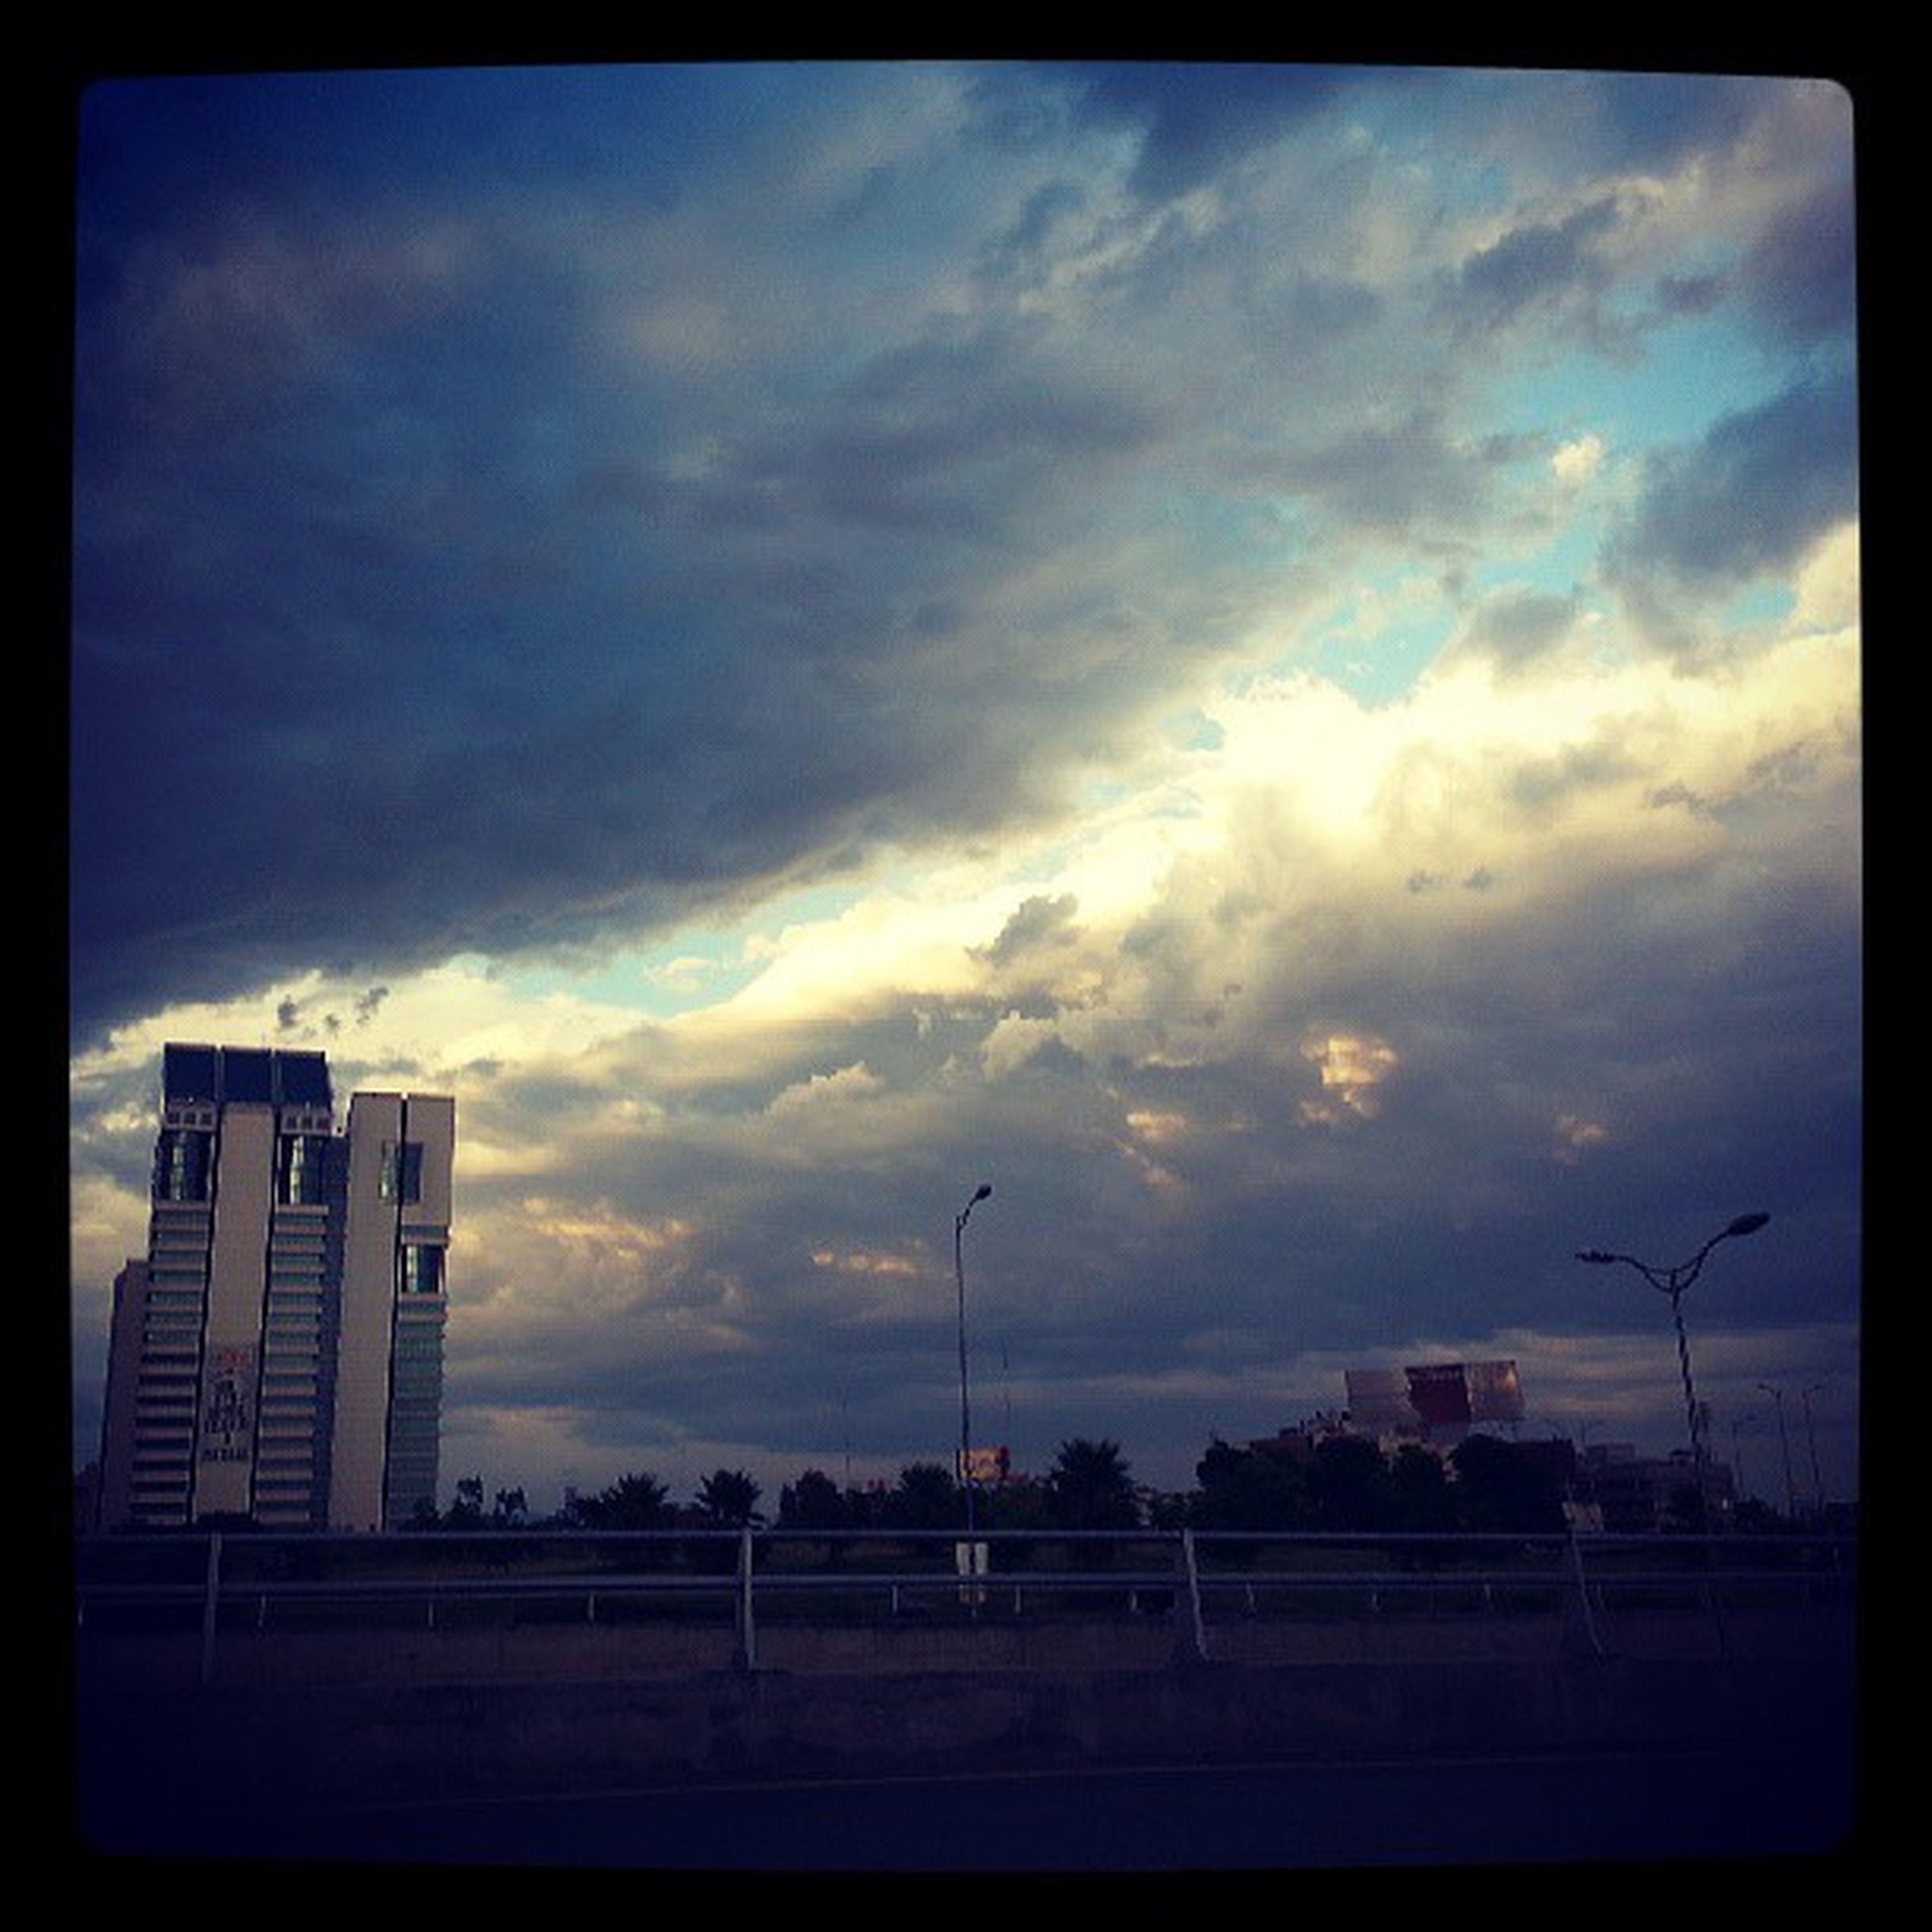 sky, cloud - sky, transfer print, cloudy, auto post production filter, building exterior, built structure, cloud, architecture, overcast, transportation, weather, street light, city, dusk, fence, outdoors, nature, silhouette, sunset